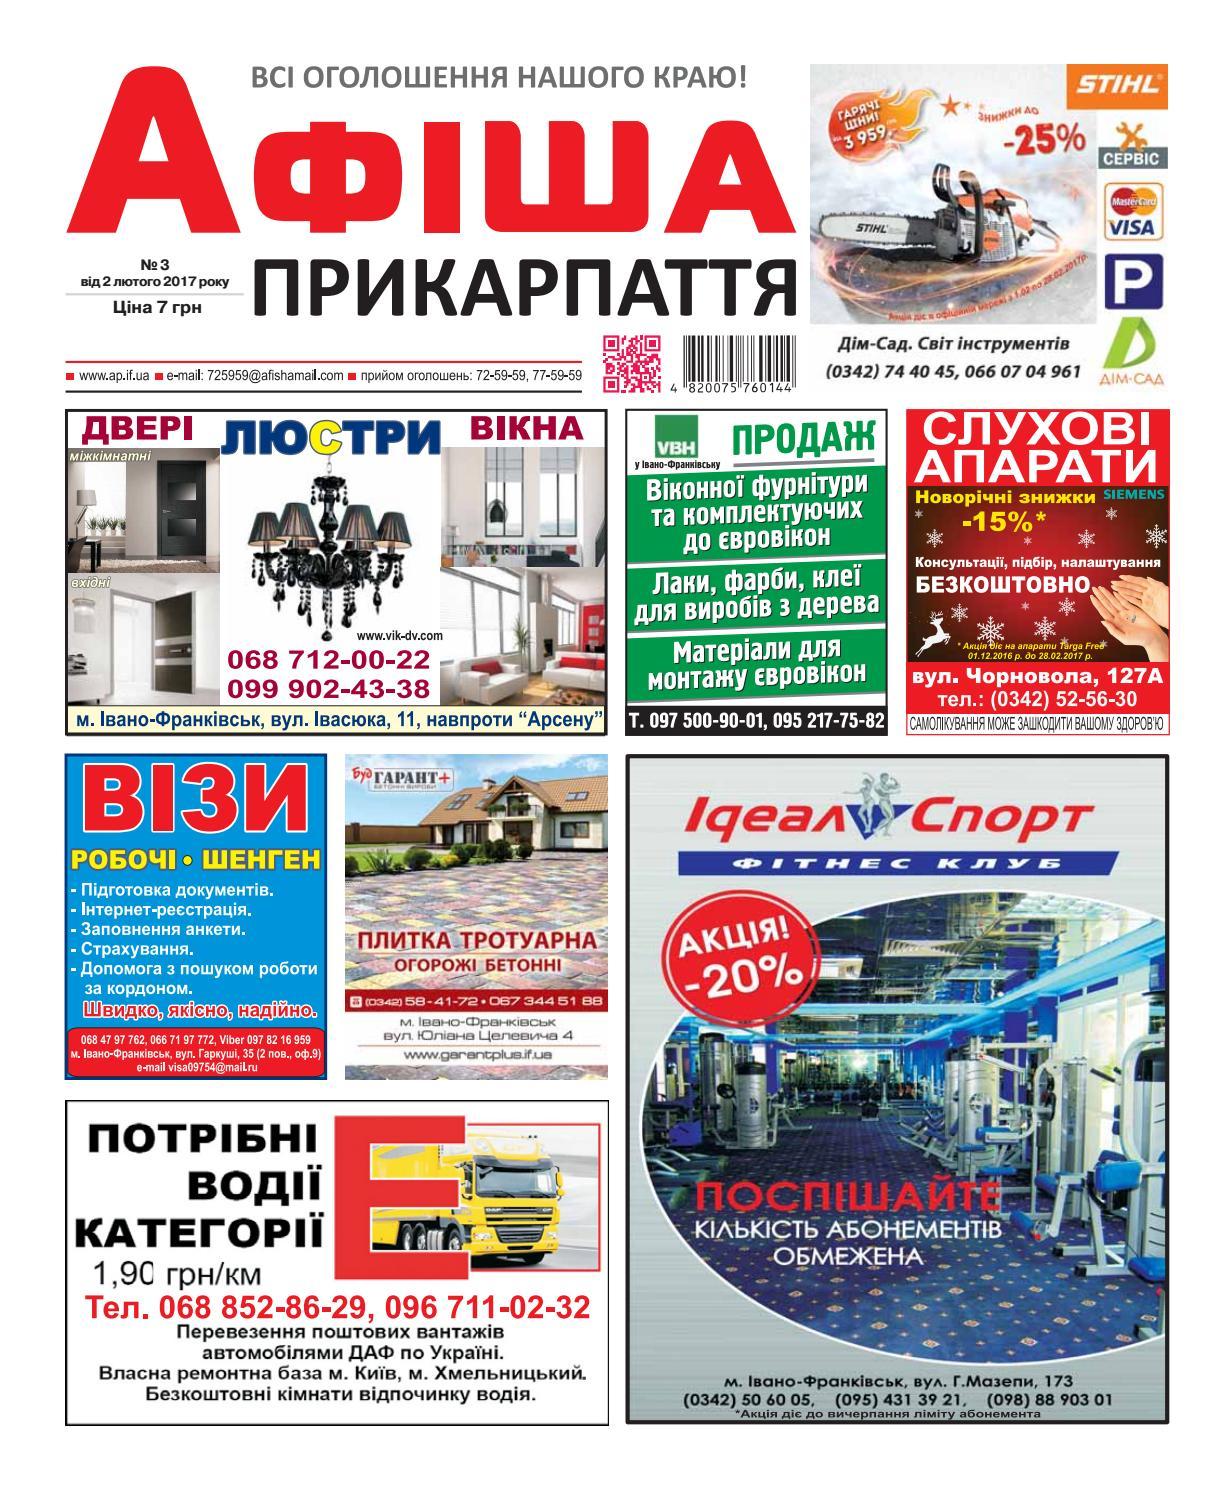 Афіша Прикарпаття №3 by Olya Olya - issuu ca2cc132a5aa4